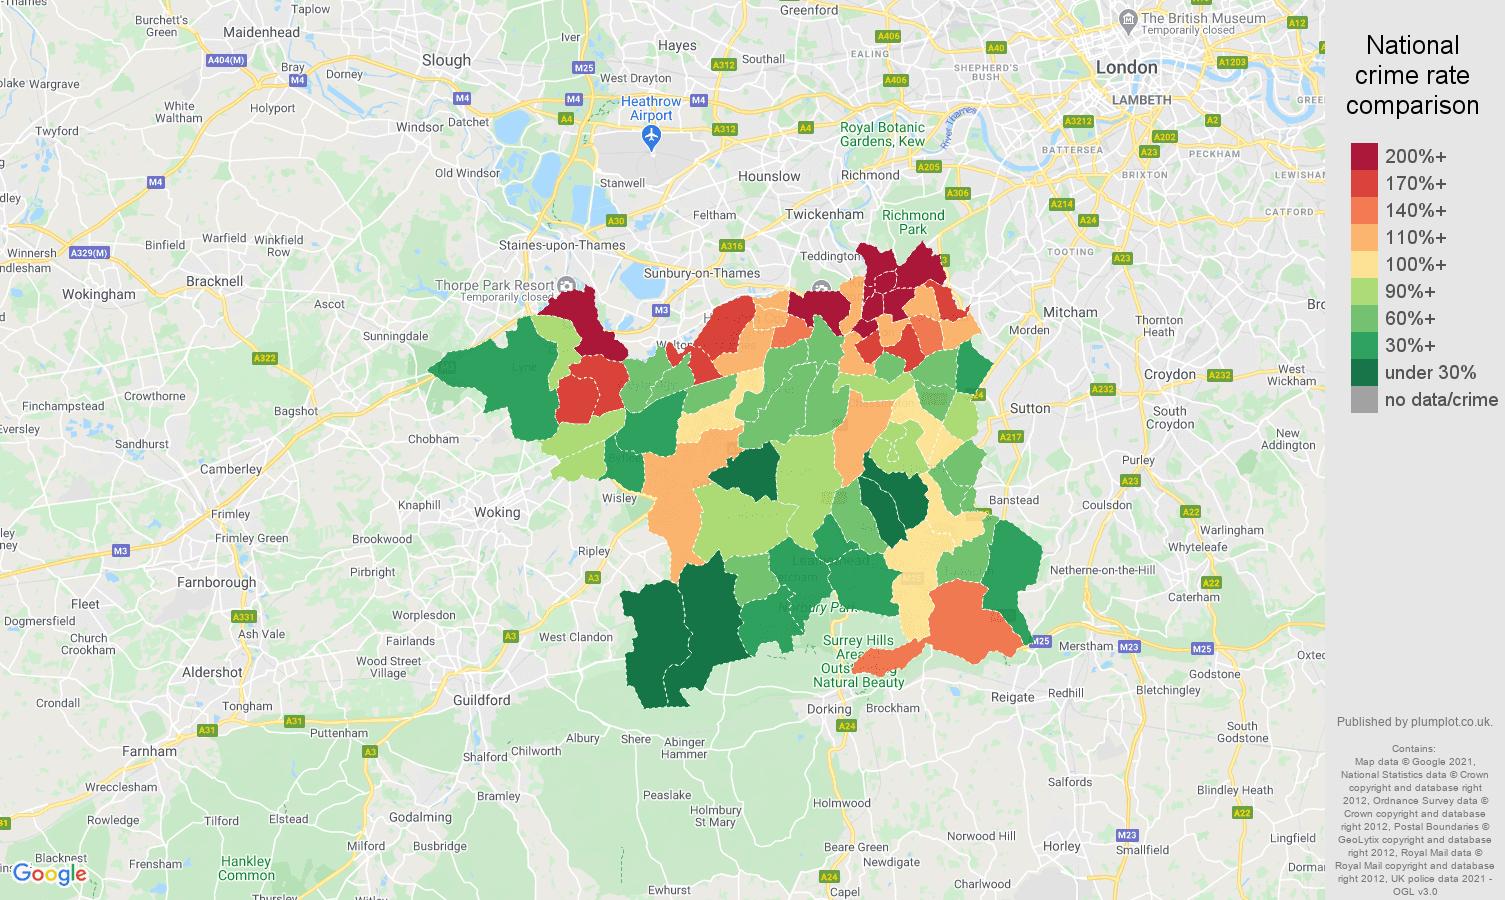 Kingston upon Thames drugs crime rate comparison map